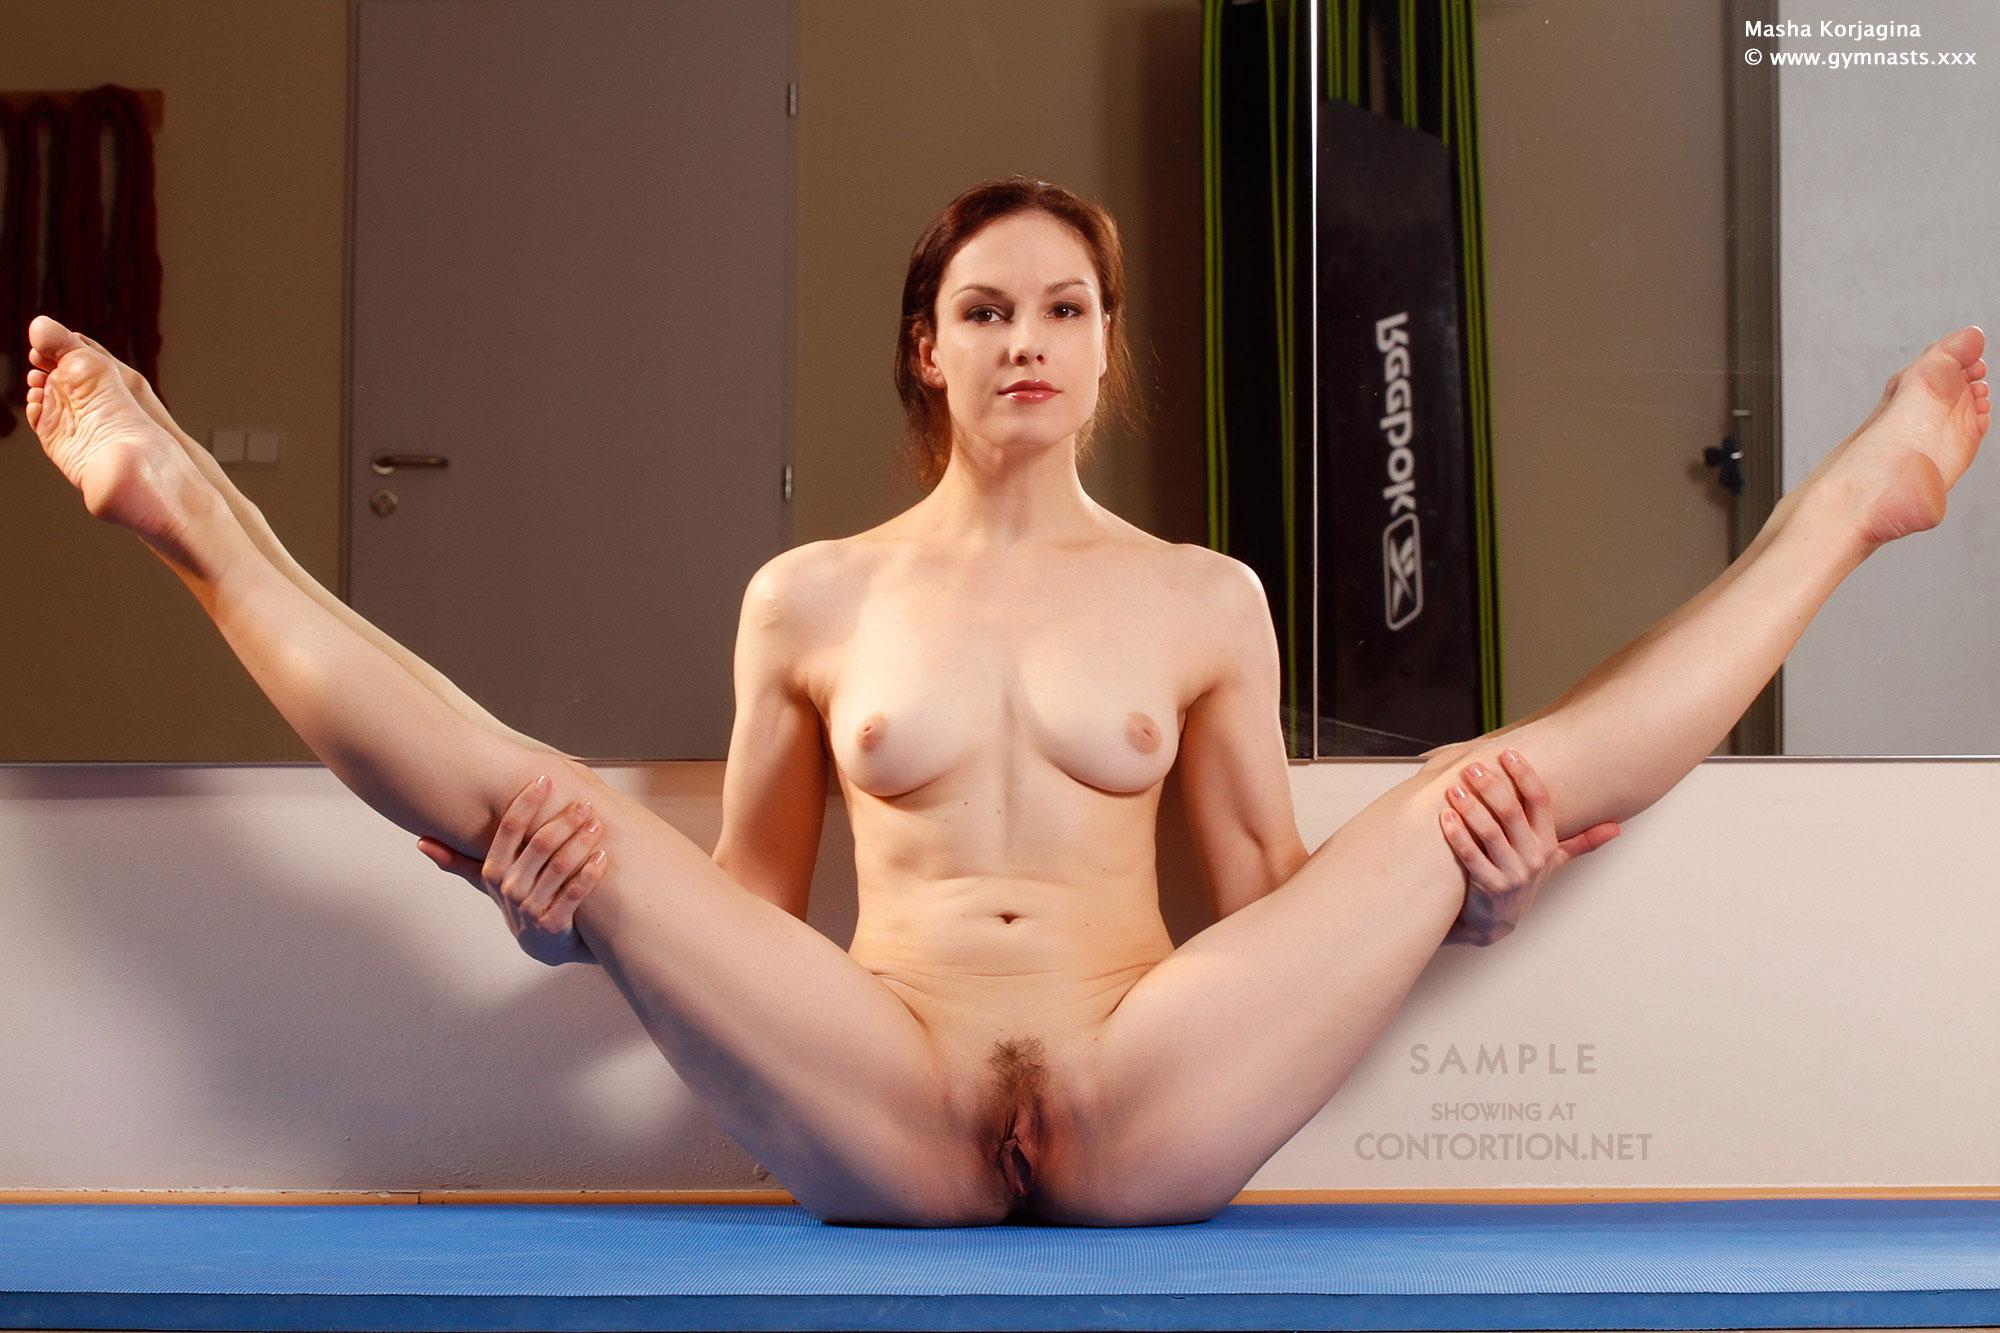 Xxx images of erica the gymnast, huge cock amatuers